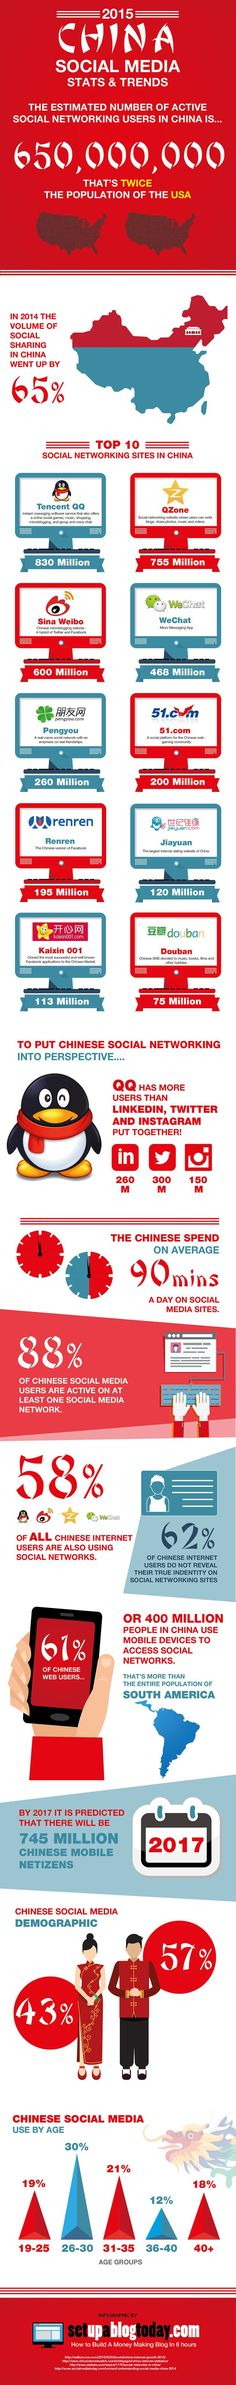 2015 China Social Media Stats And Trends